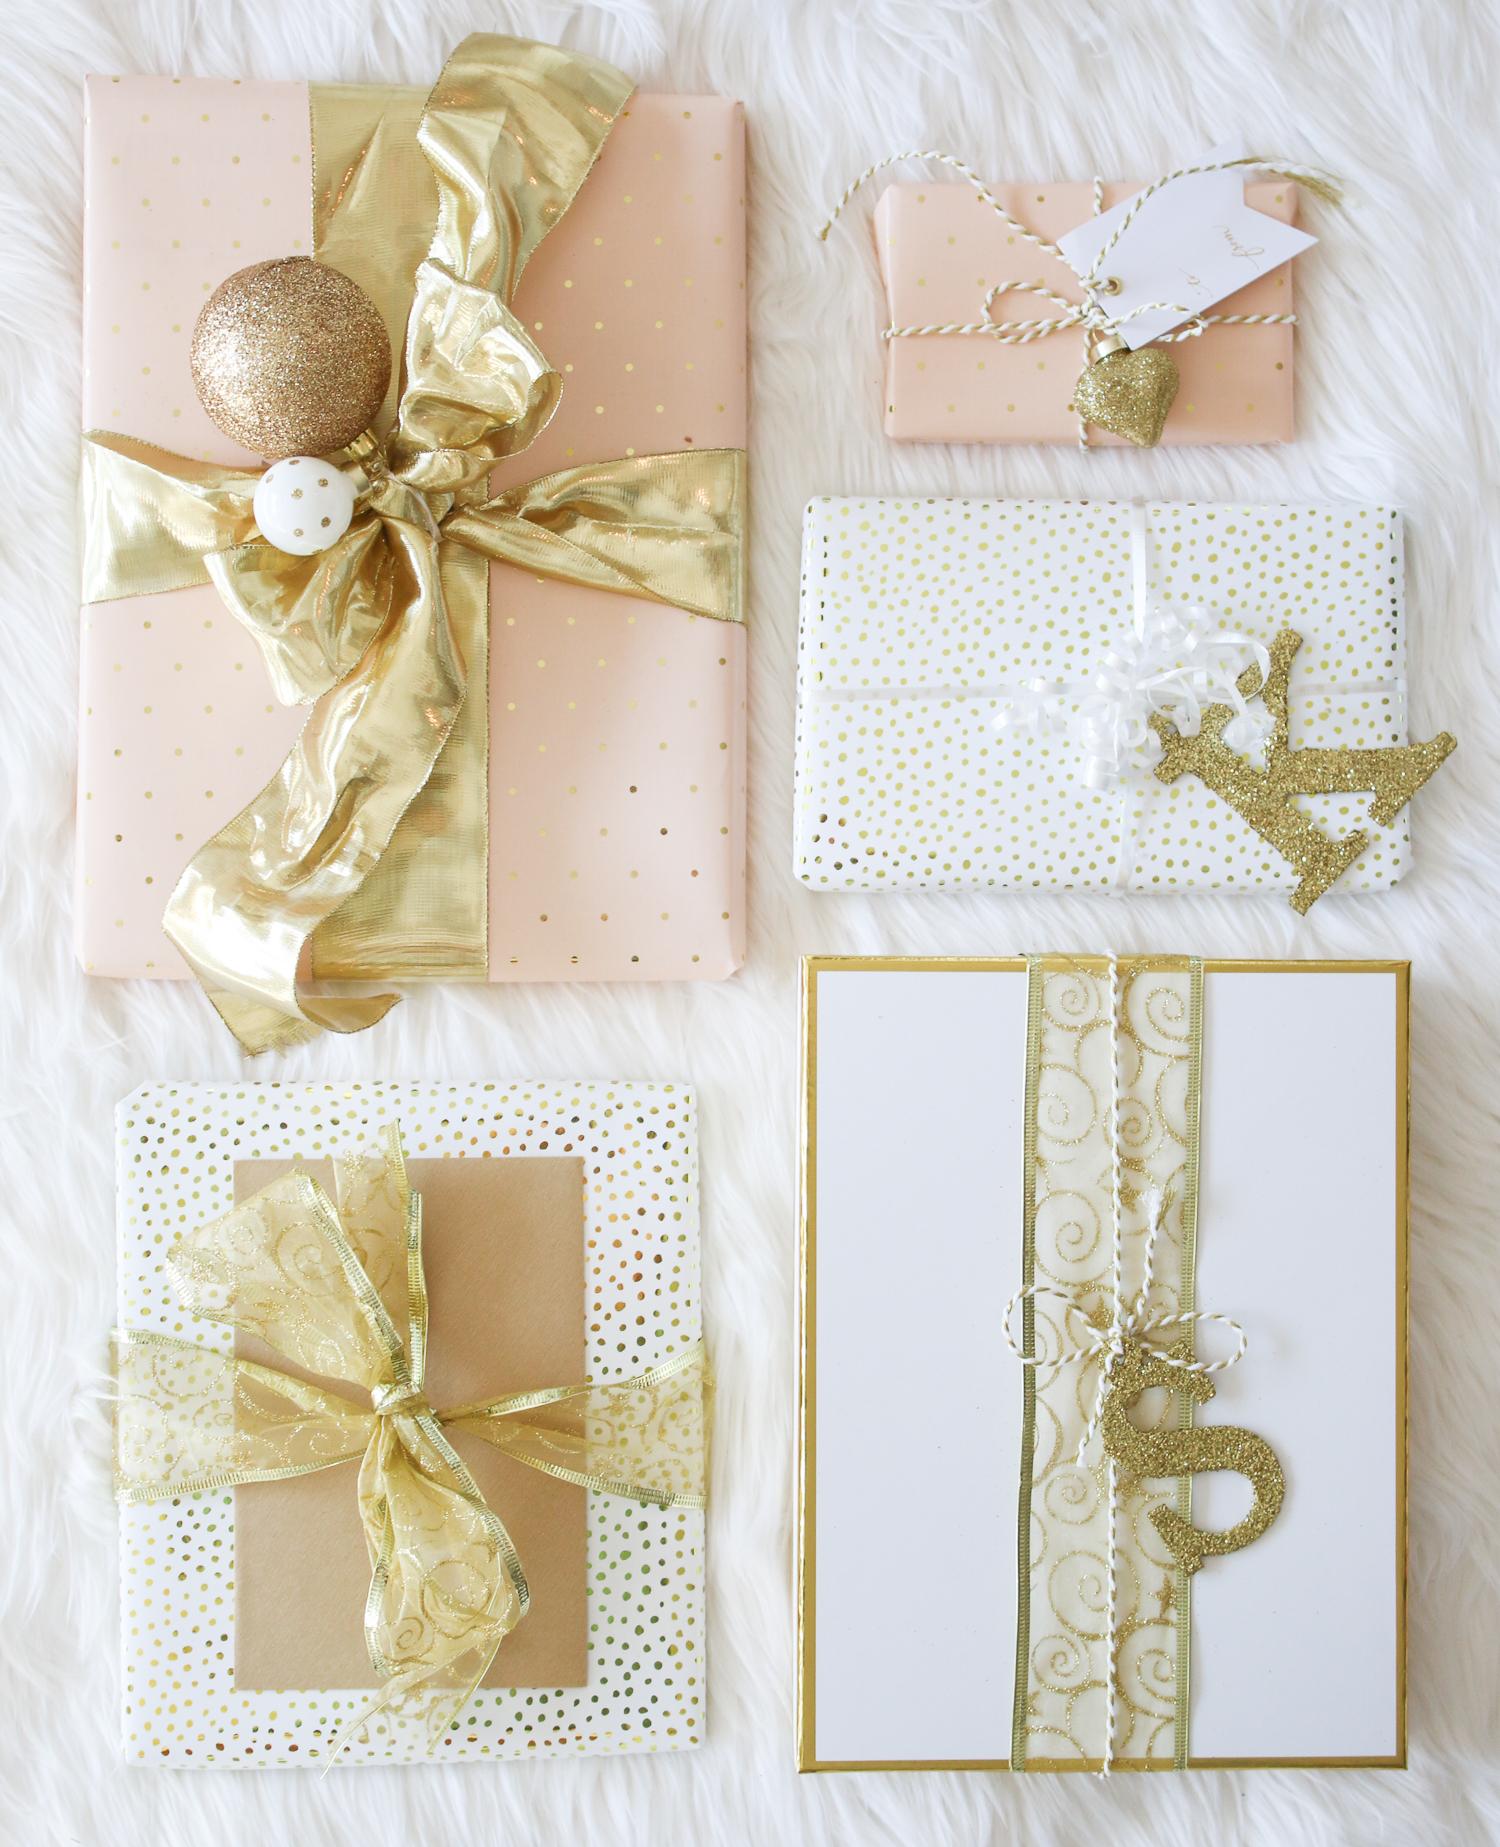 Elegant Holiday Gift Wrap Ideas Diary Of A Debutante